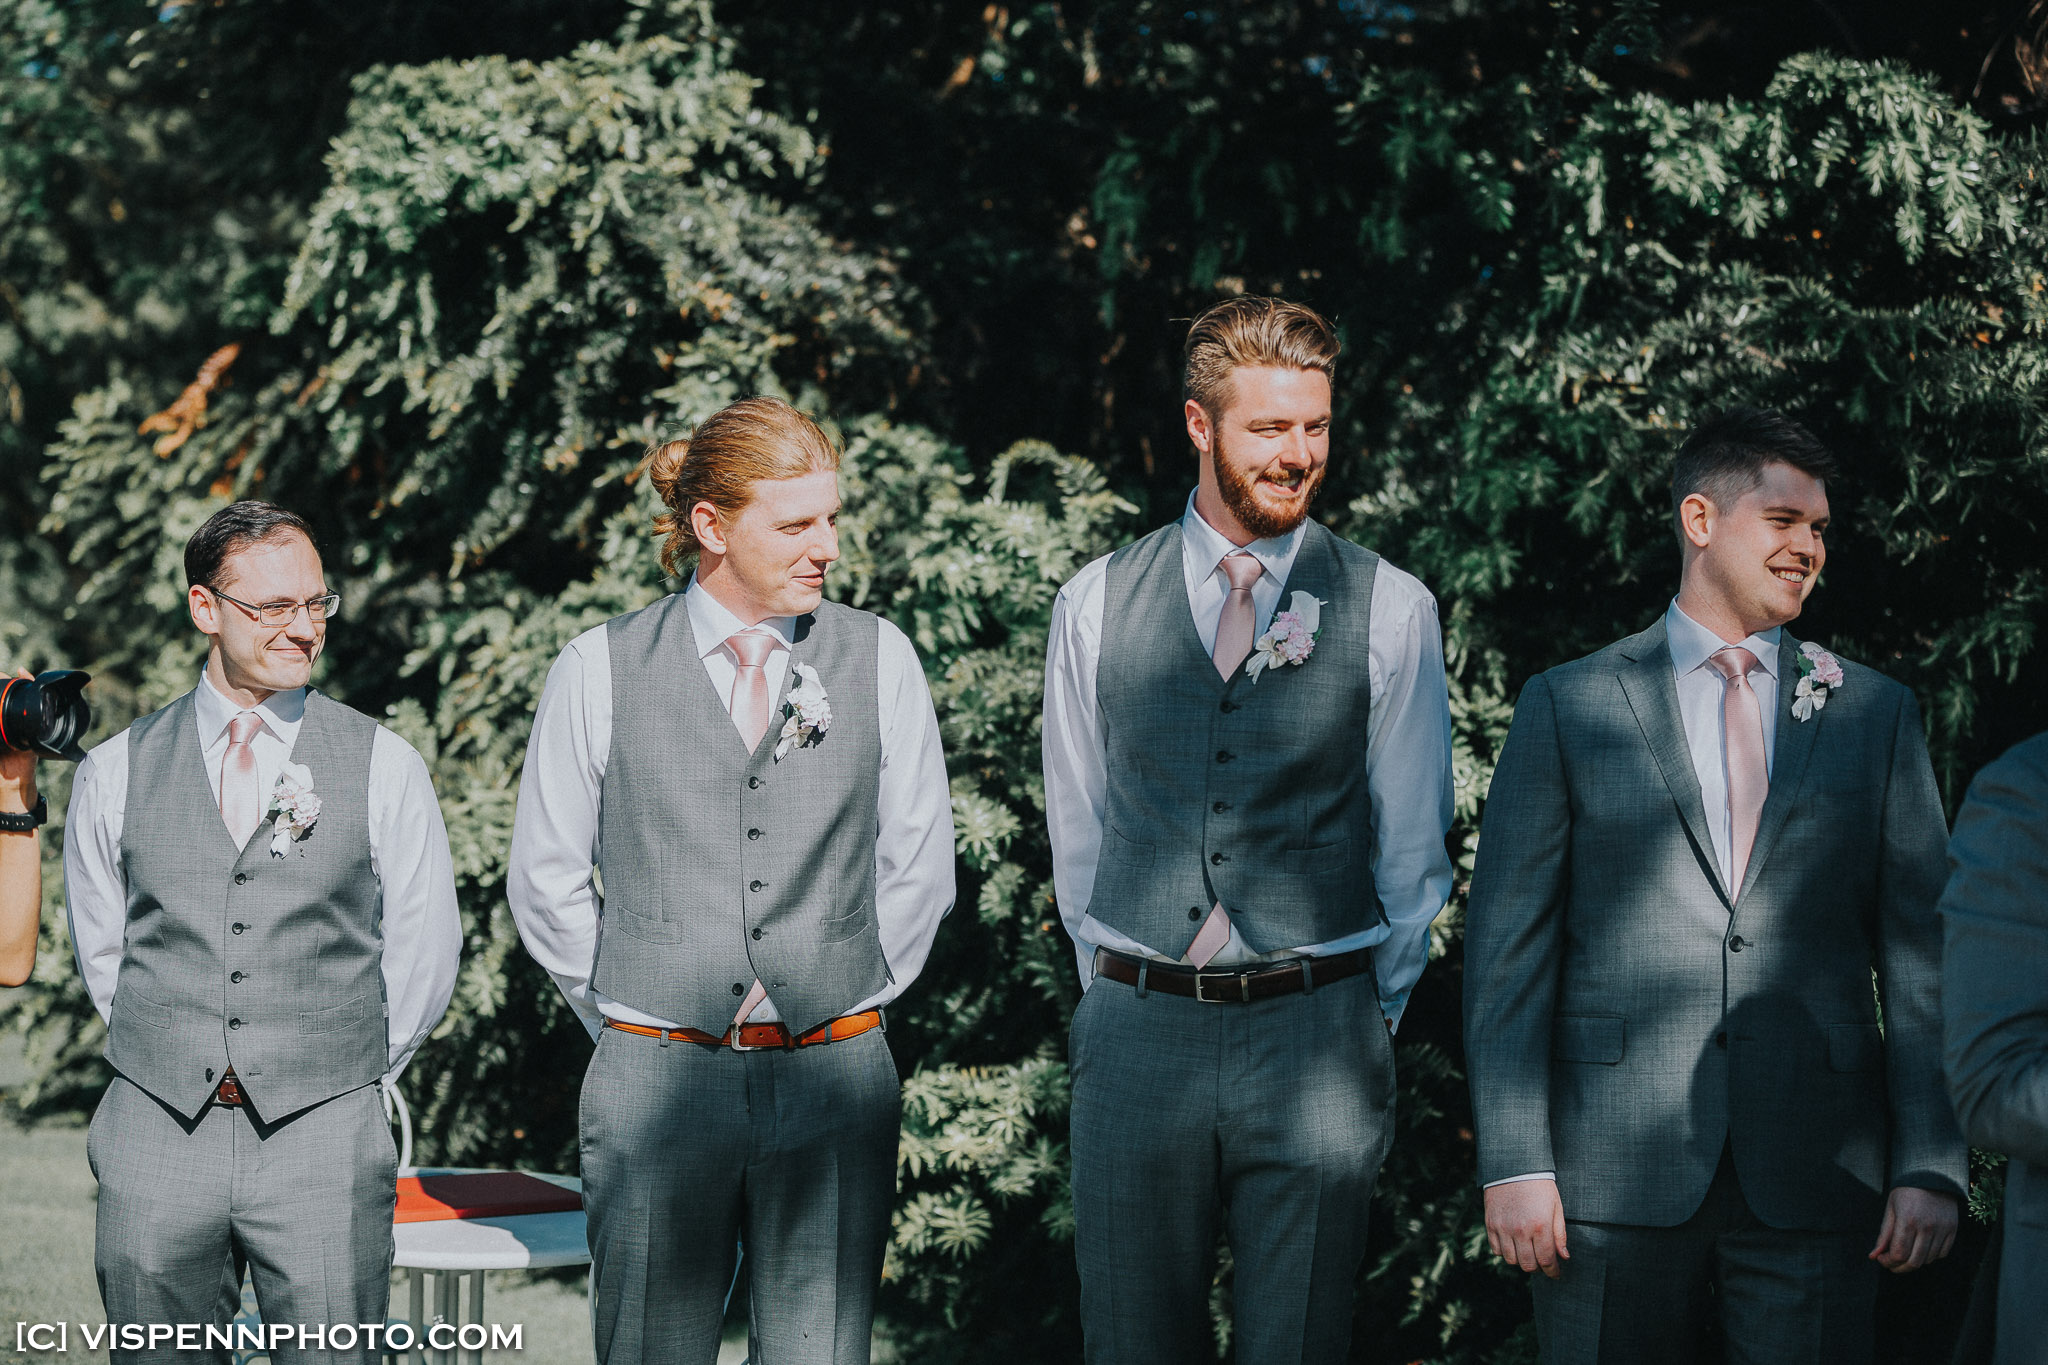 WEDDING DAY Photography Melbourne VISPENN 墨尔本 婚礼跟拍 婚礼摄像 婚礼摄影 结婚照 登记照 VISPENN Kat H1 01652